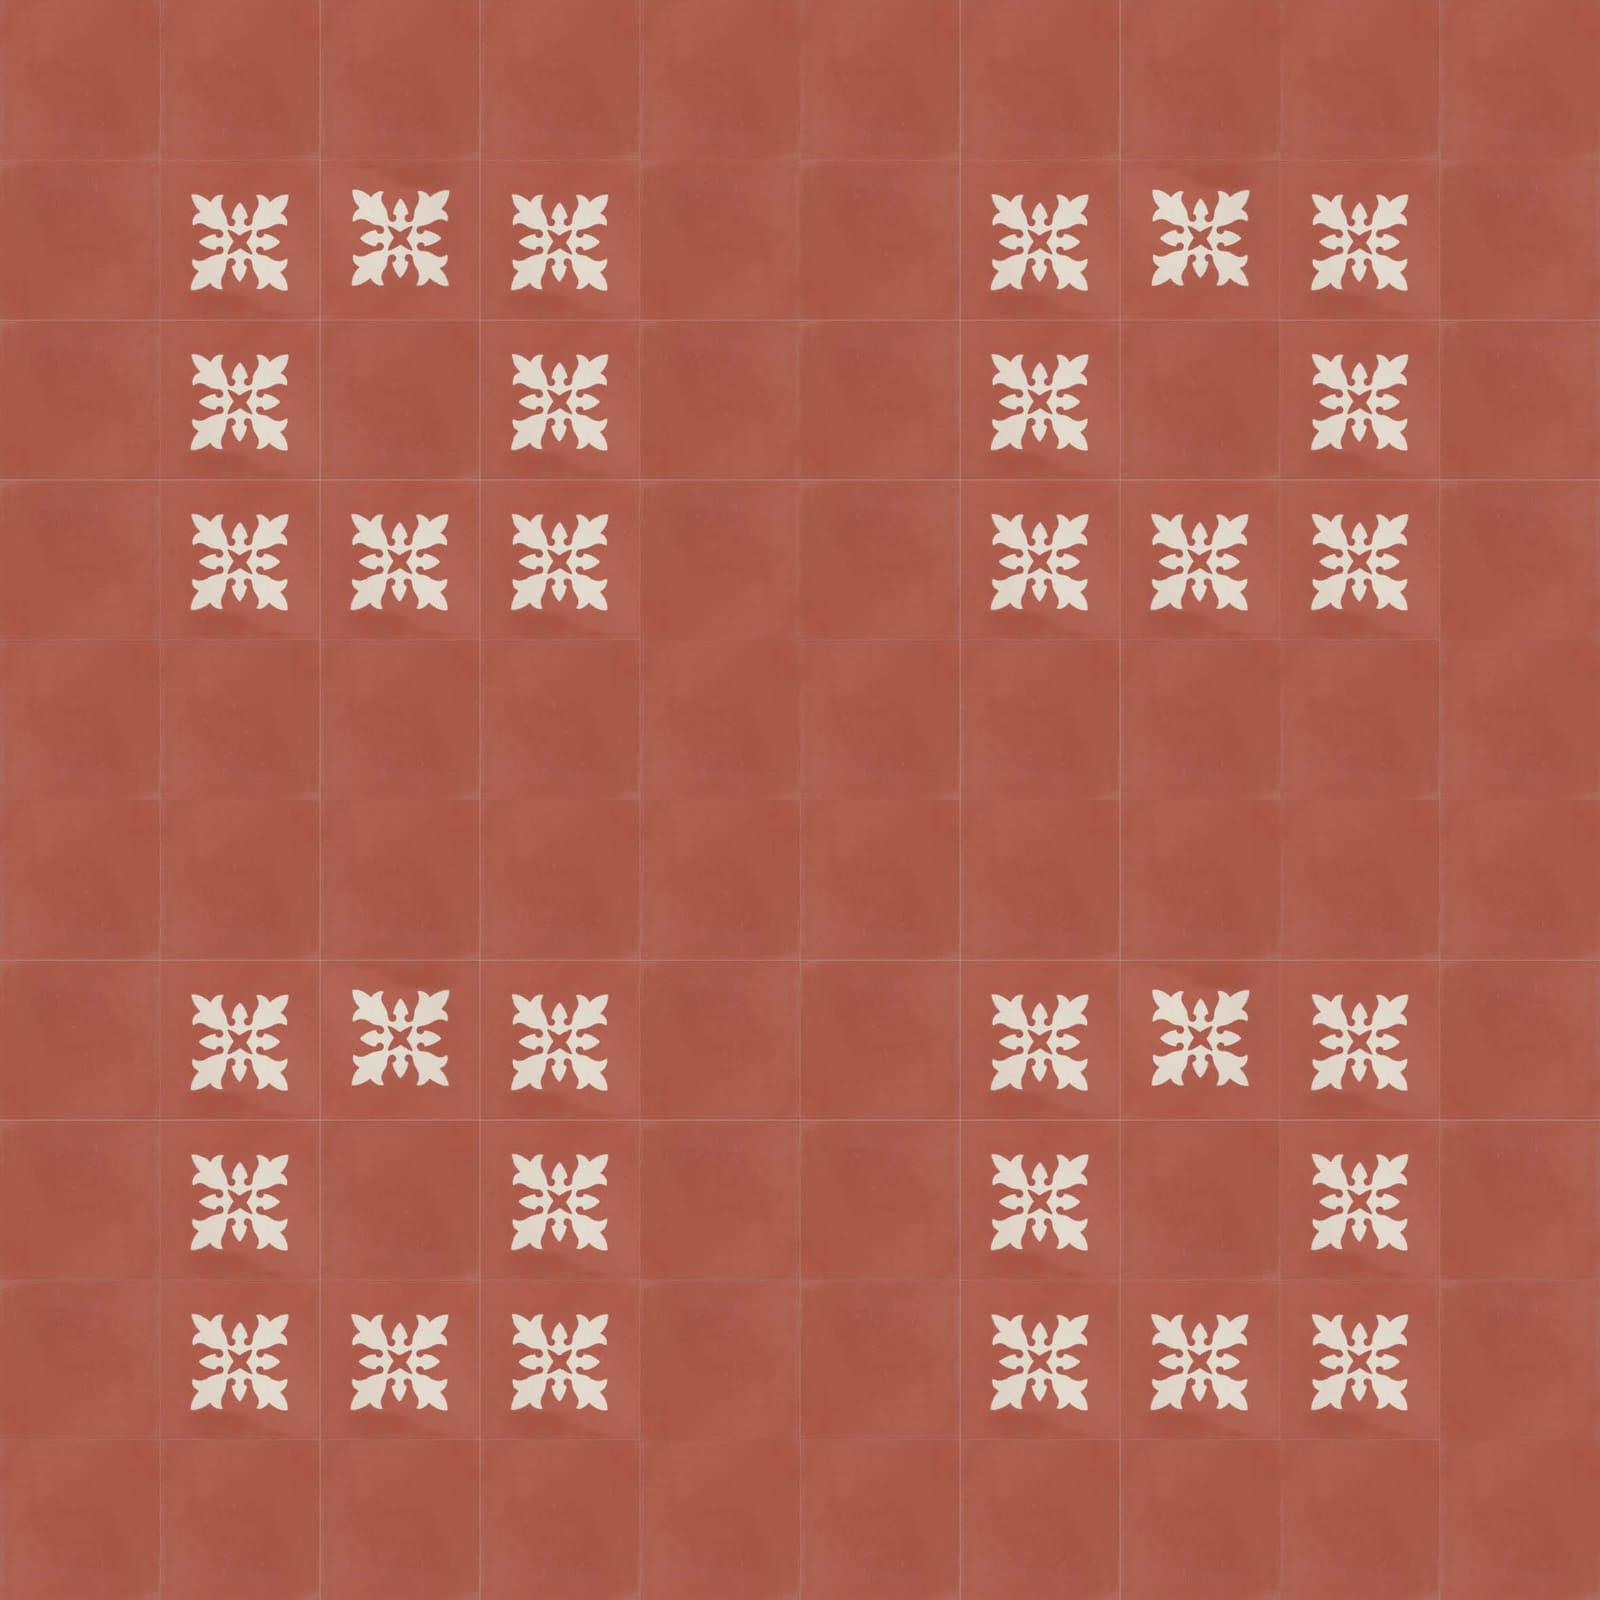 zementfliesen-verlegemuster-nummer-10932-viaplatten   10932